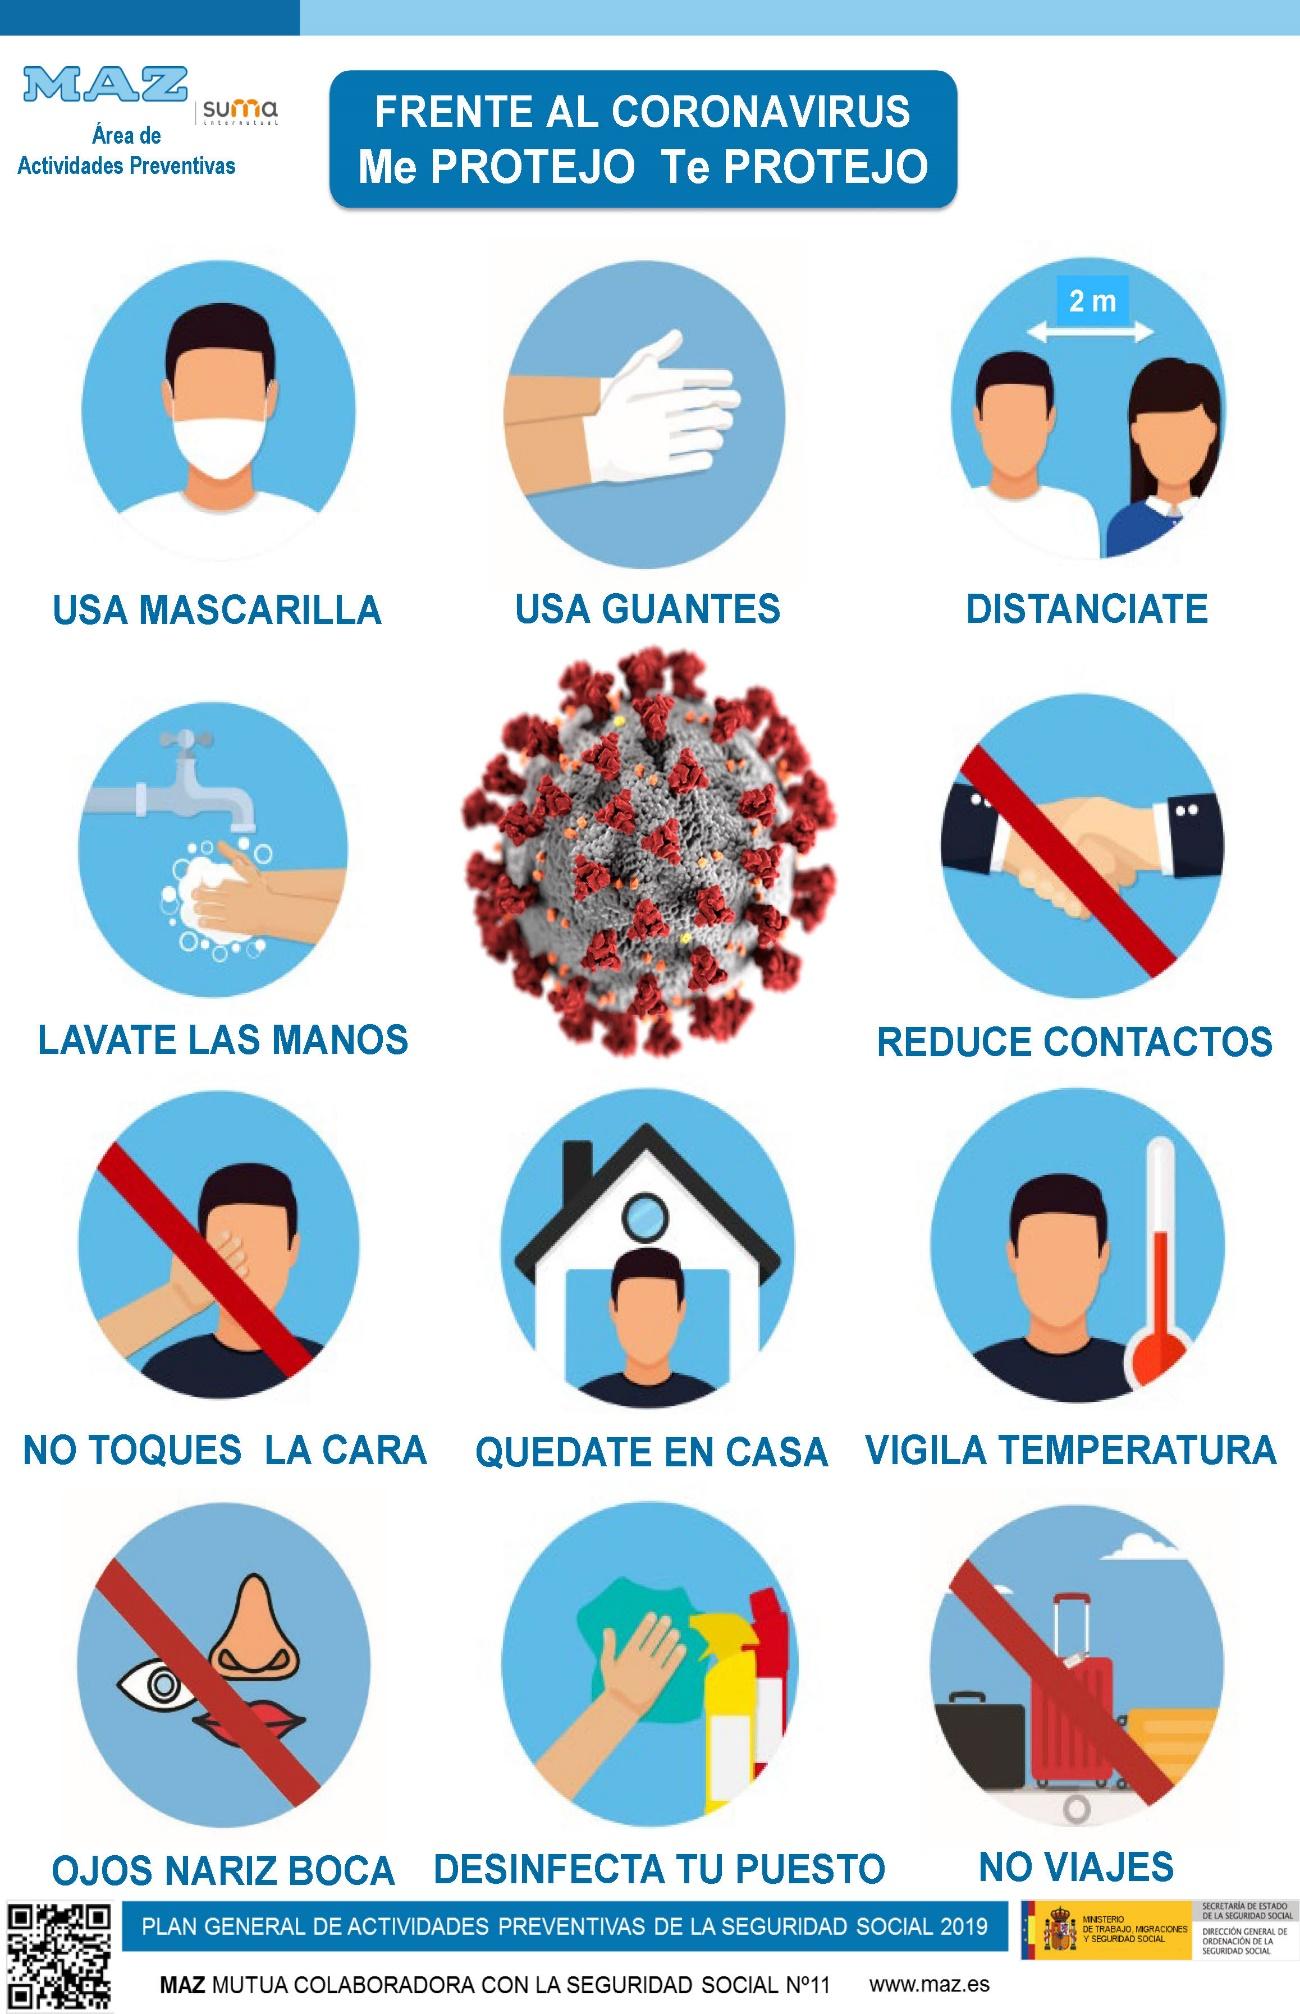 https://www.maz.es/prevencion/MaterialSensibilizacion/Documents/covid19/mutua-maz-cartel-decalogo-recomendaciones-prl-coronavirus-covid-19.jpg